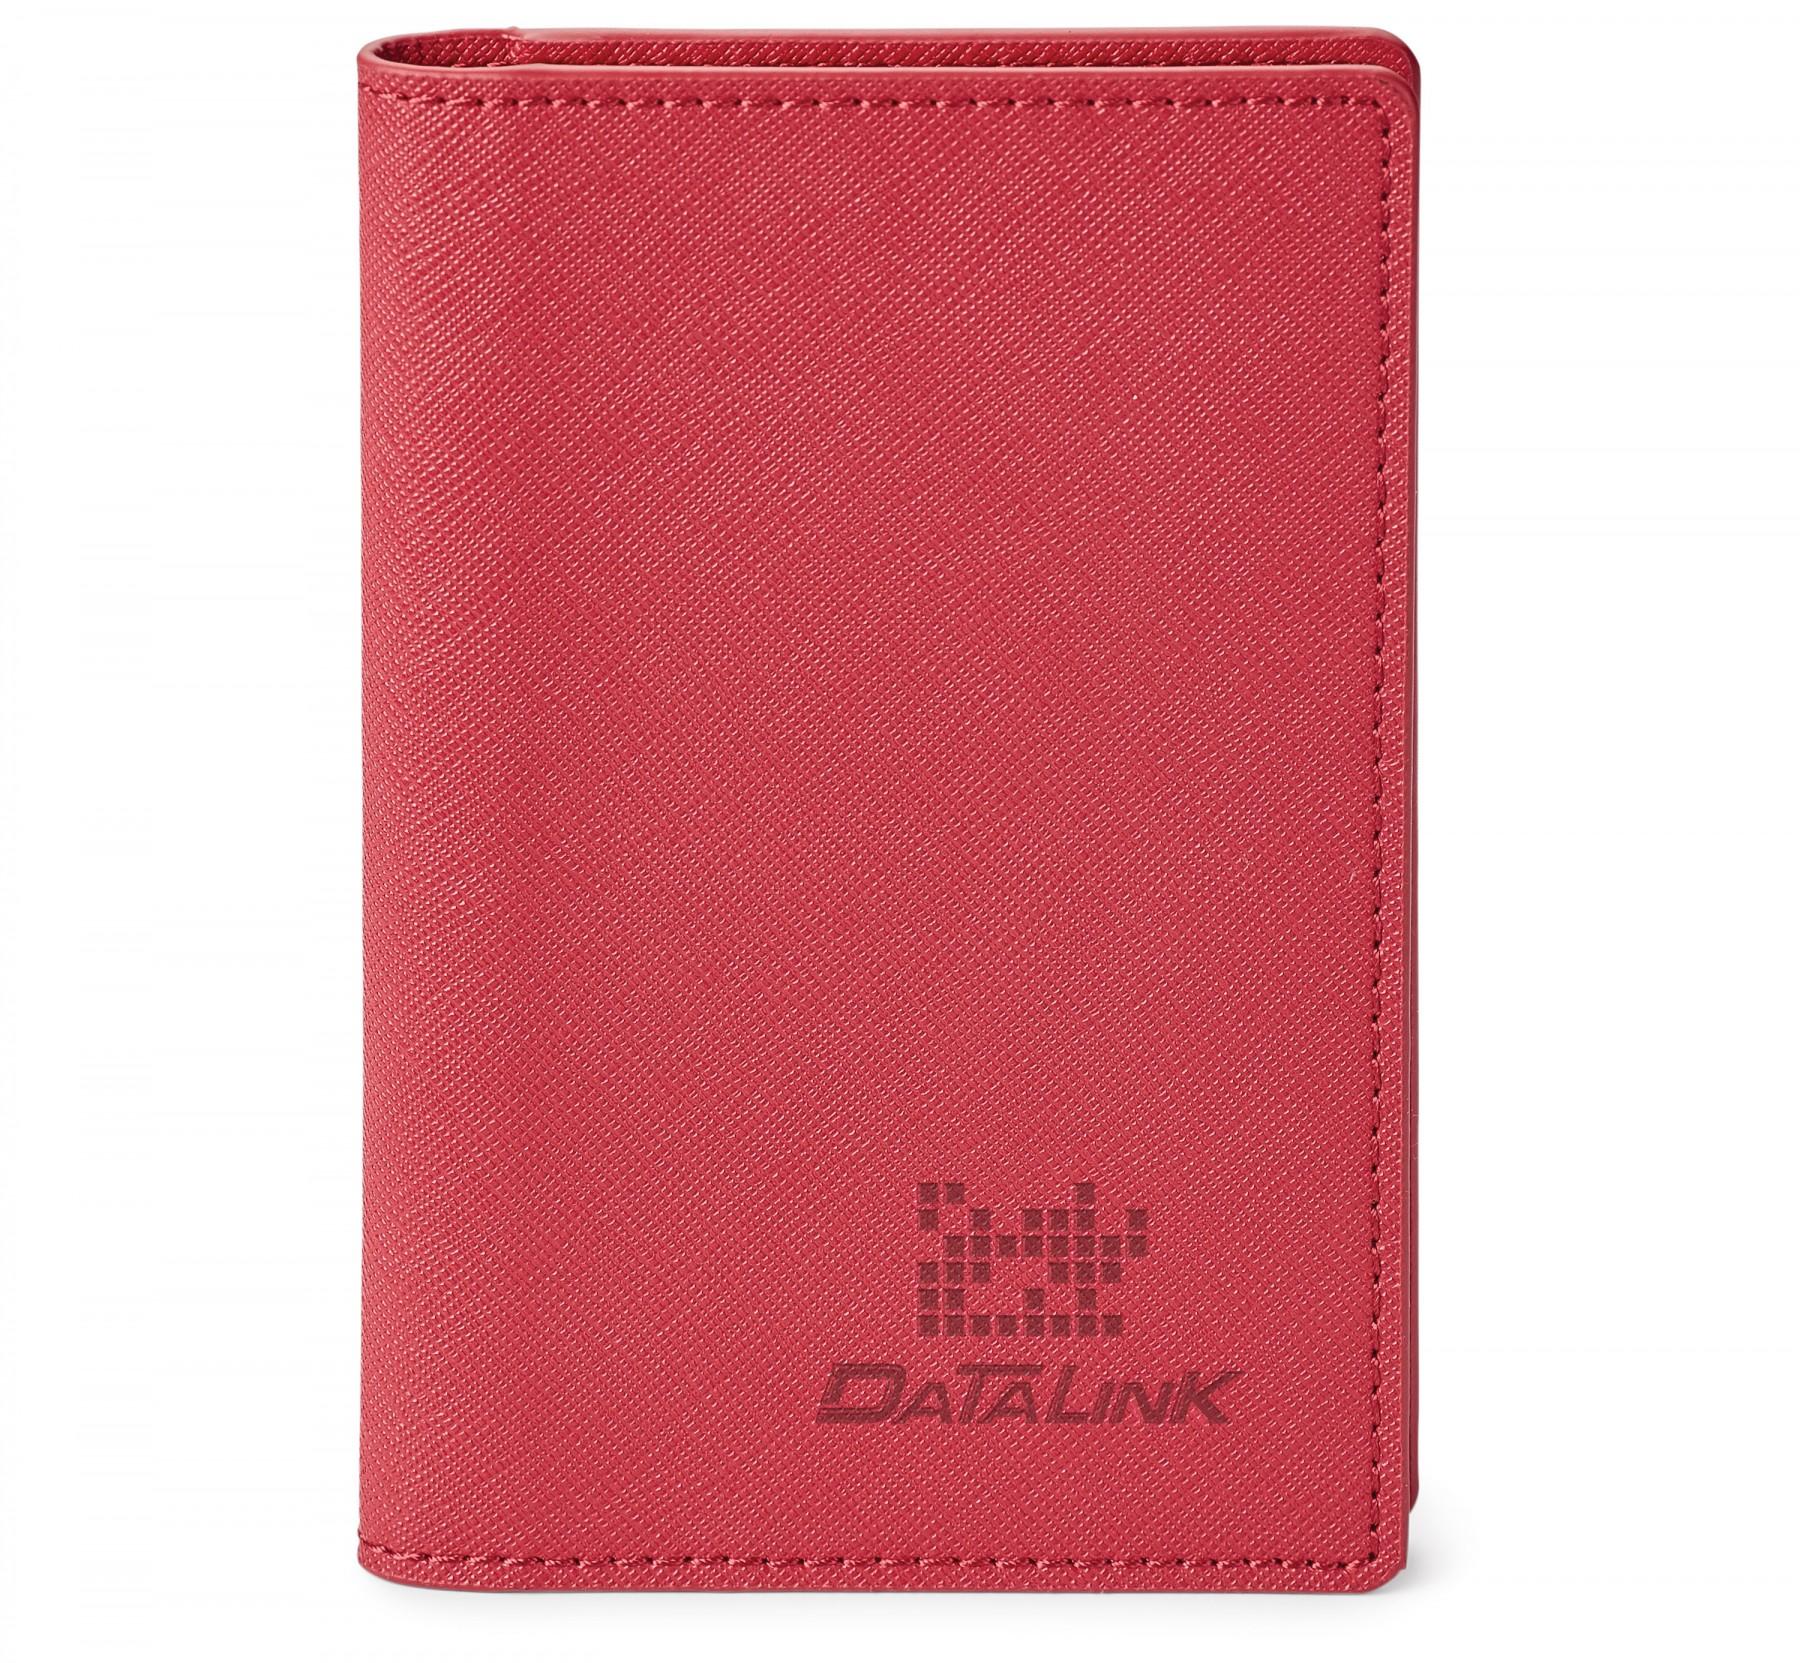 Porte-passeport en cuir véritable avec RFID